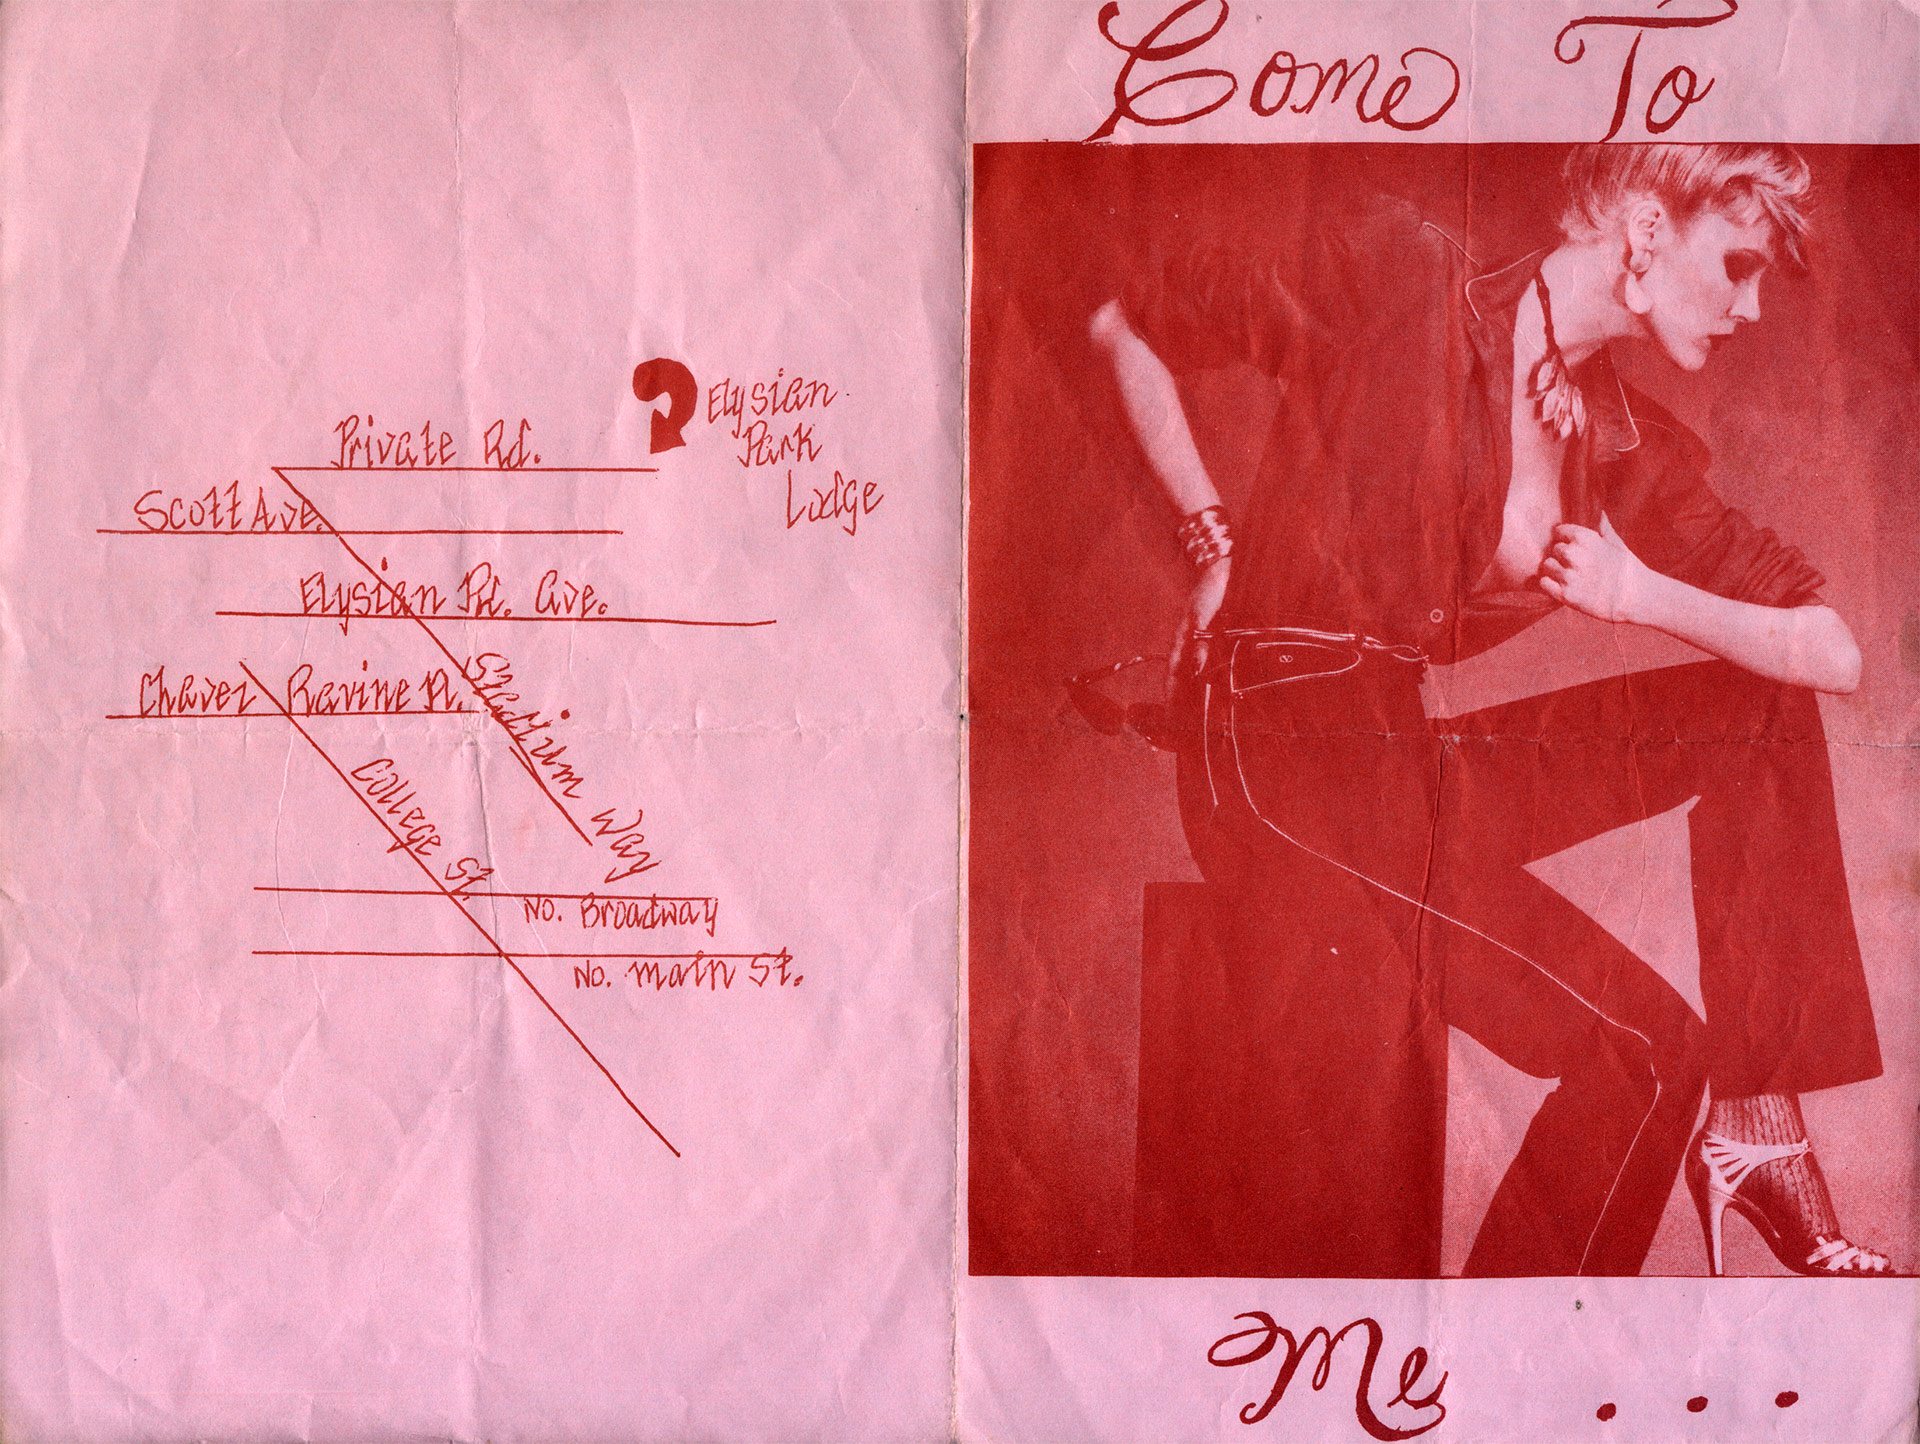 70s flyers (6)